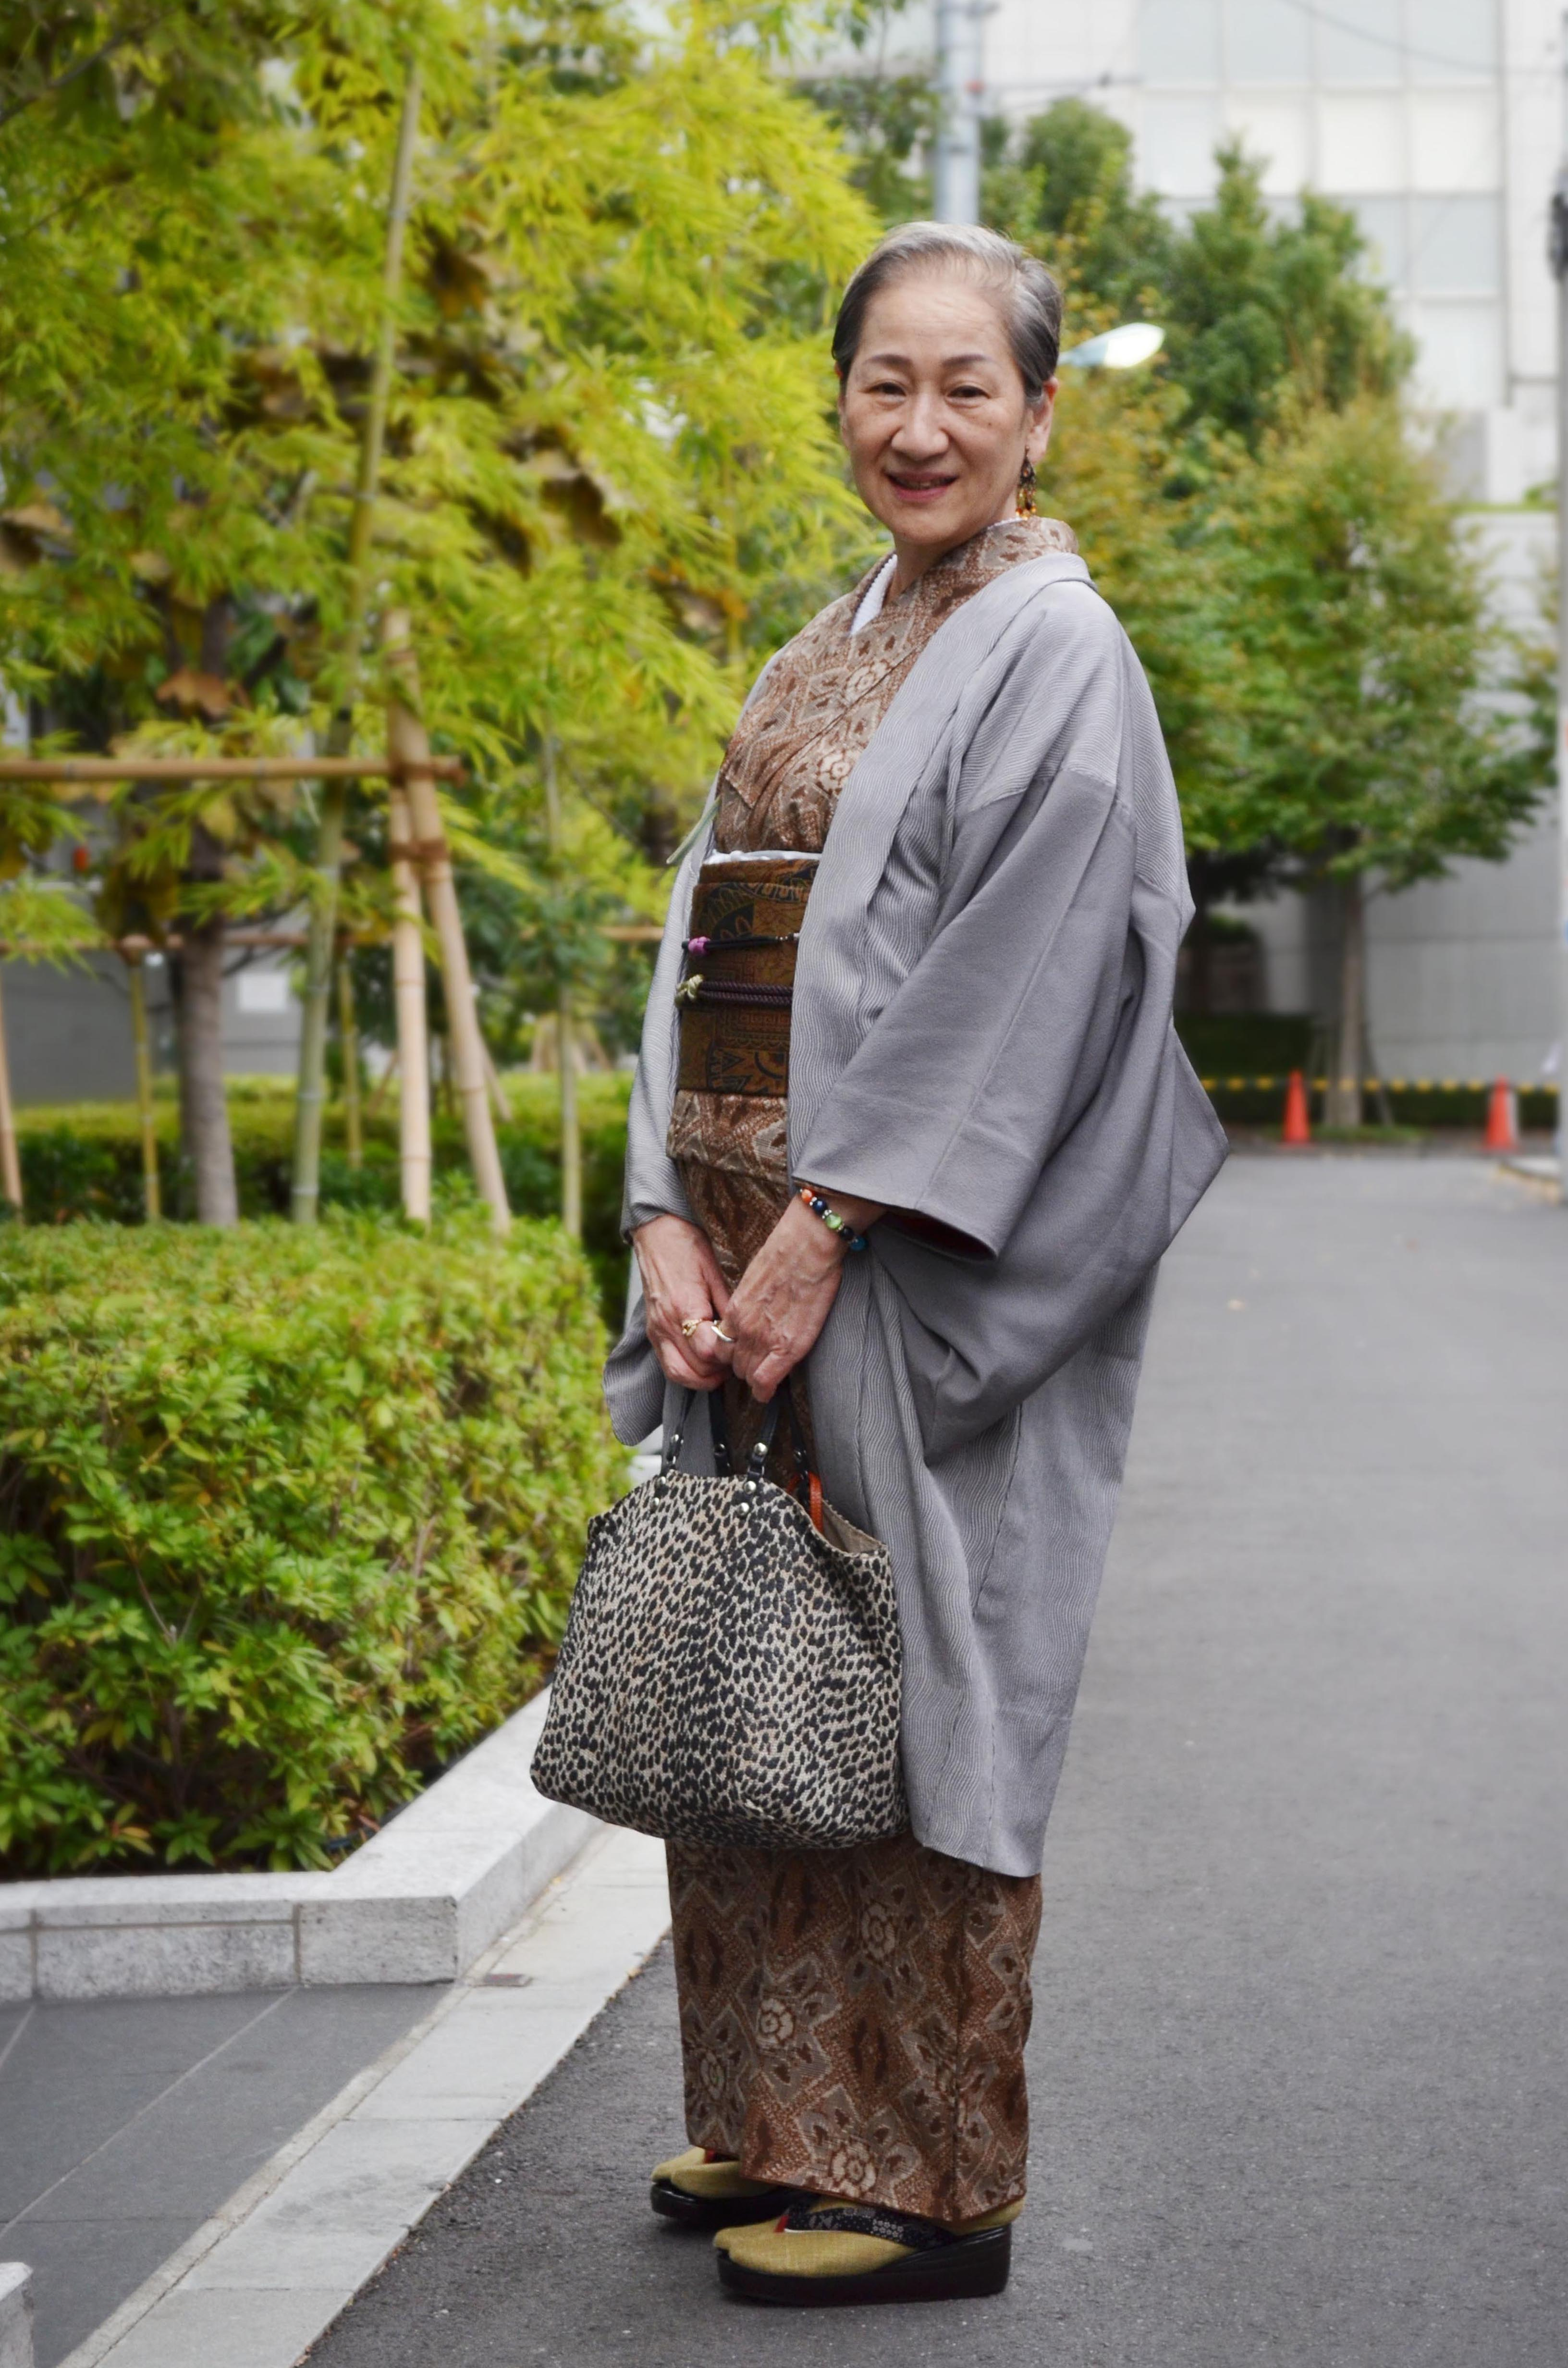 L Id 233 Al 】 038 Midori Age 60 S L Id 233 Al (リデアル)